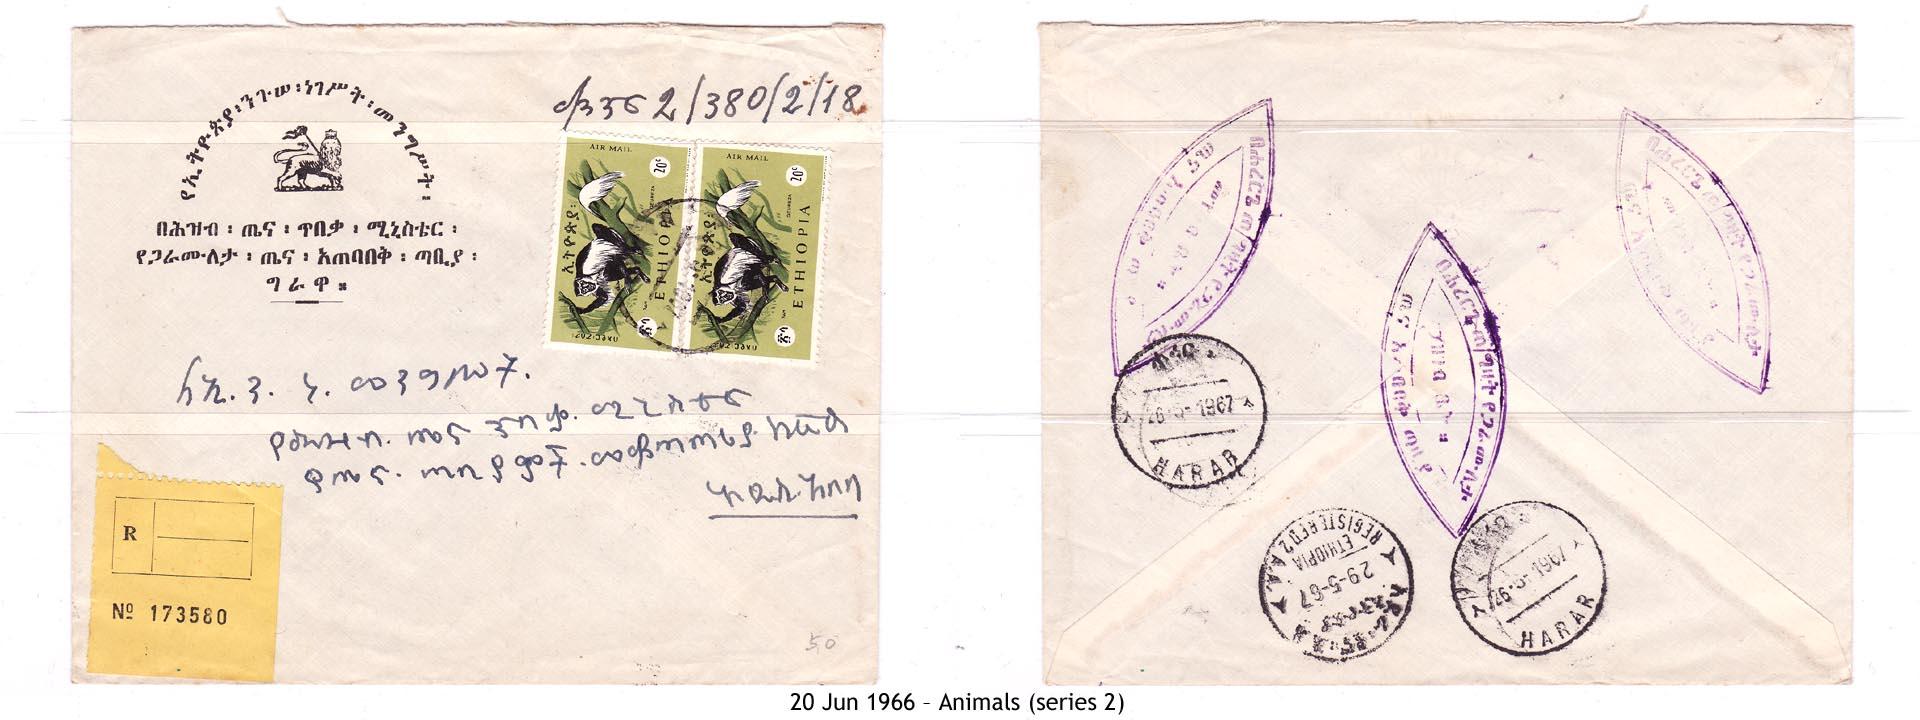 19660620 – Animals (series 2)